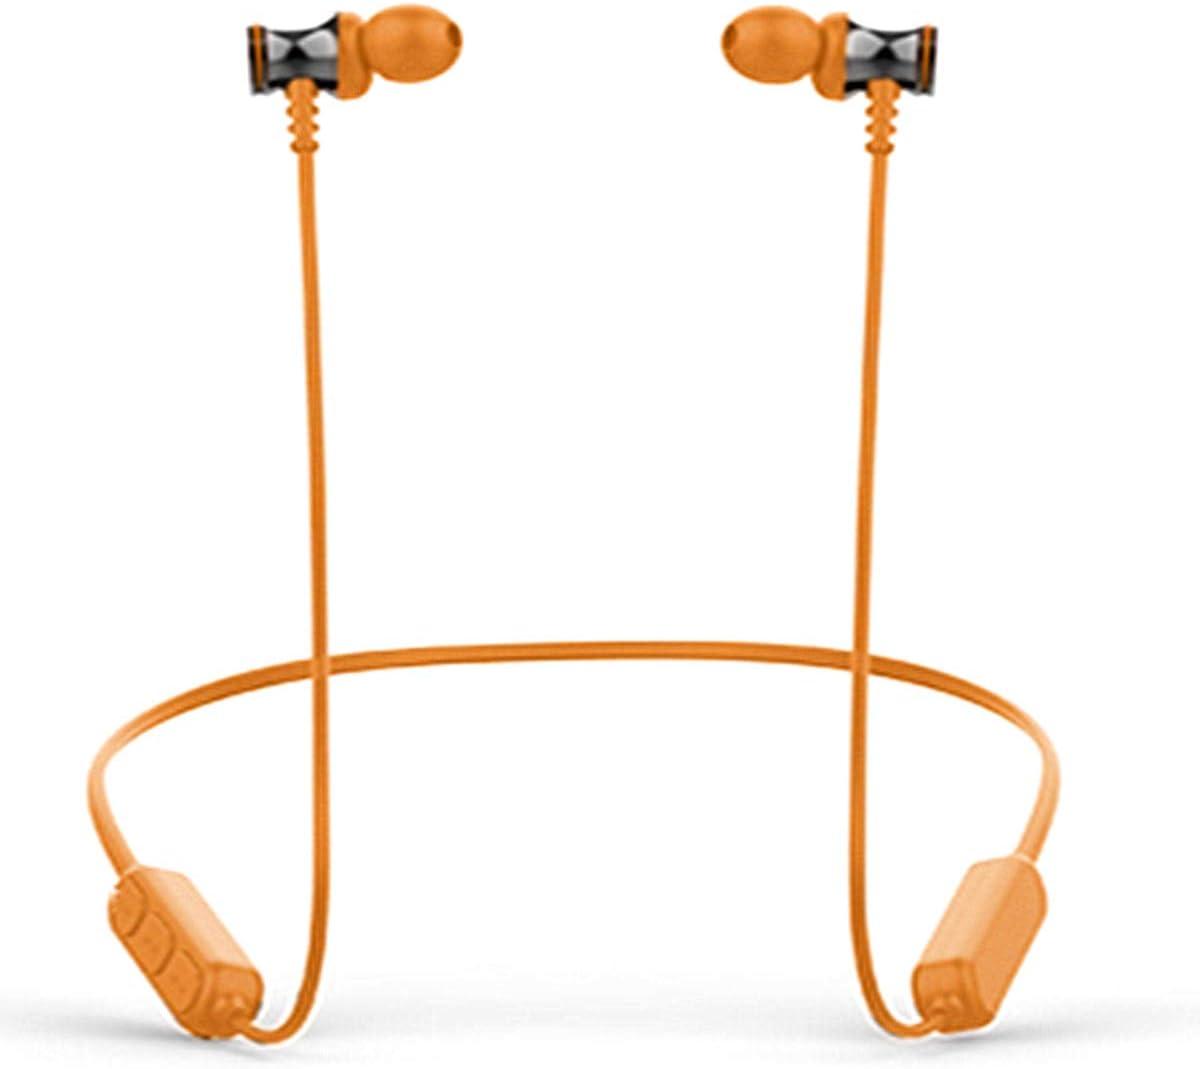 Wireless Bluetooth 5.0 Sports Sweatproof Headphones Orange